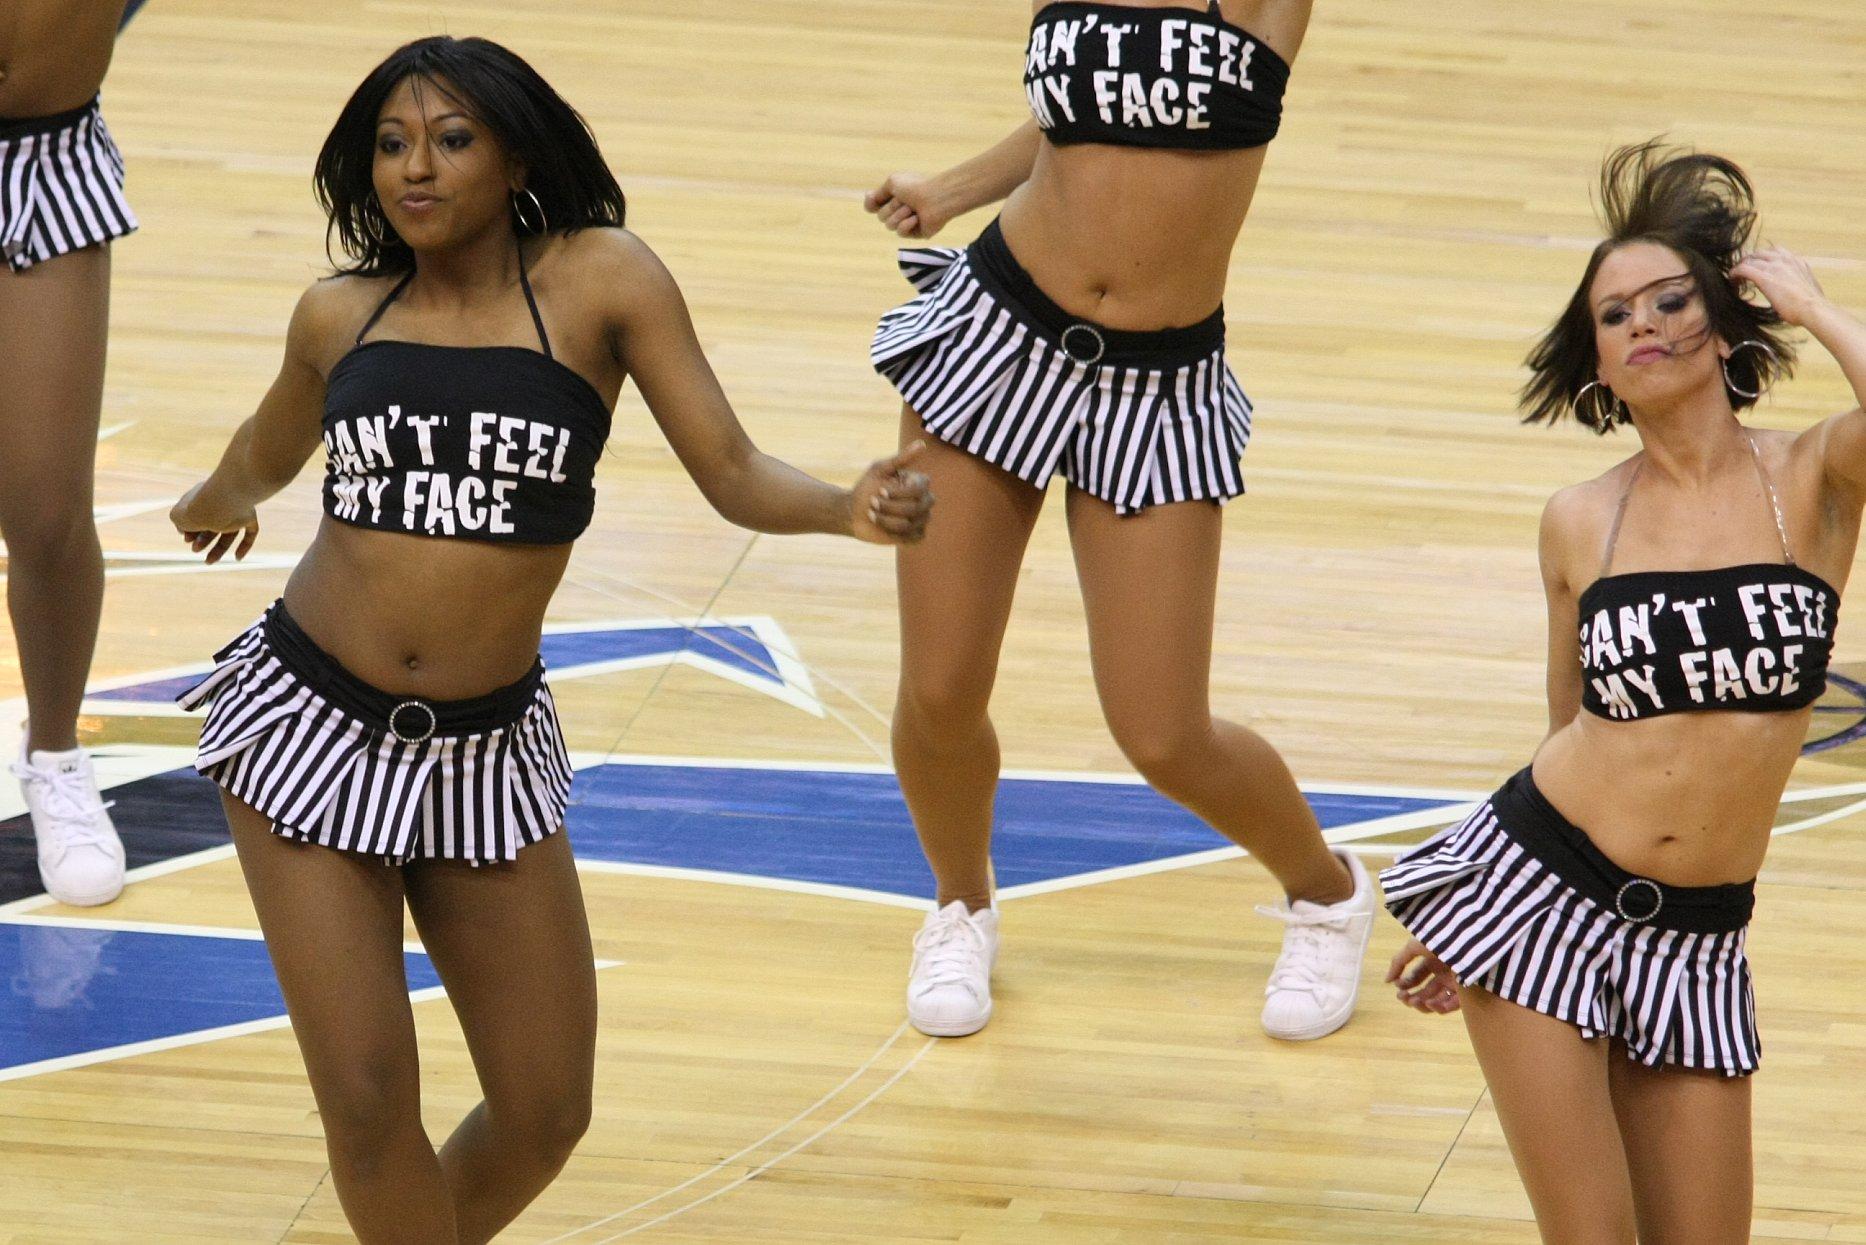 Washington Wizards (AndyDrake) Washington_Wizards_dancers_(2384812842)